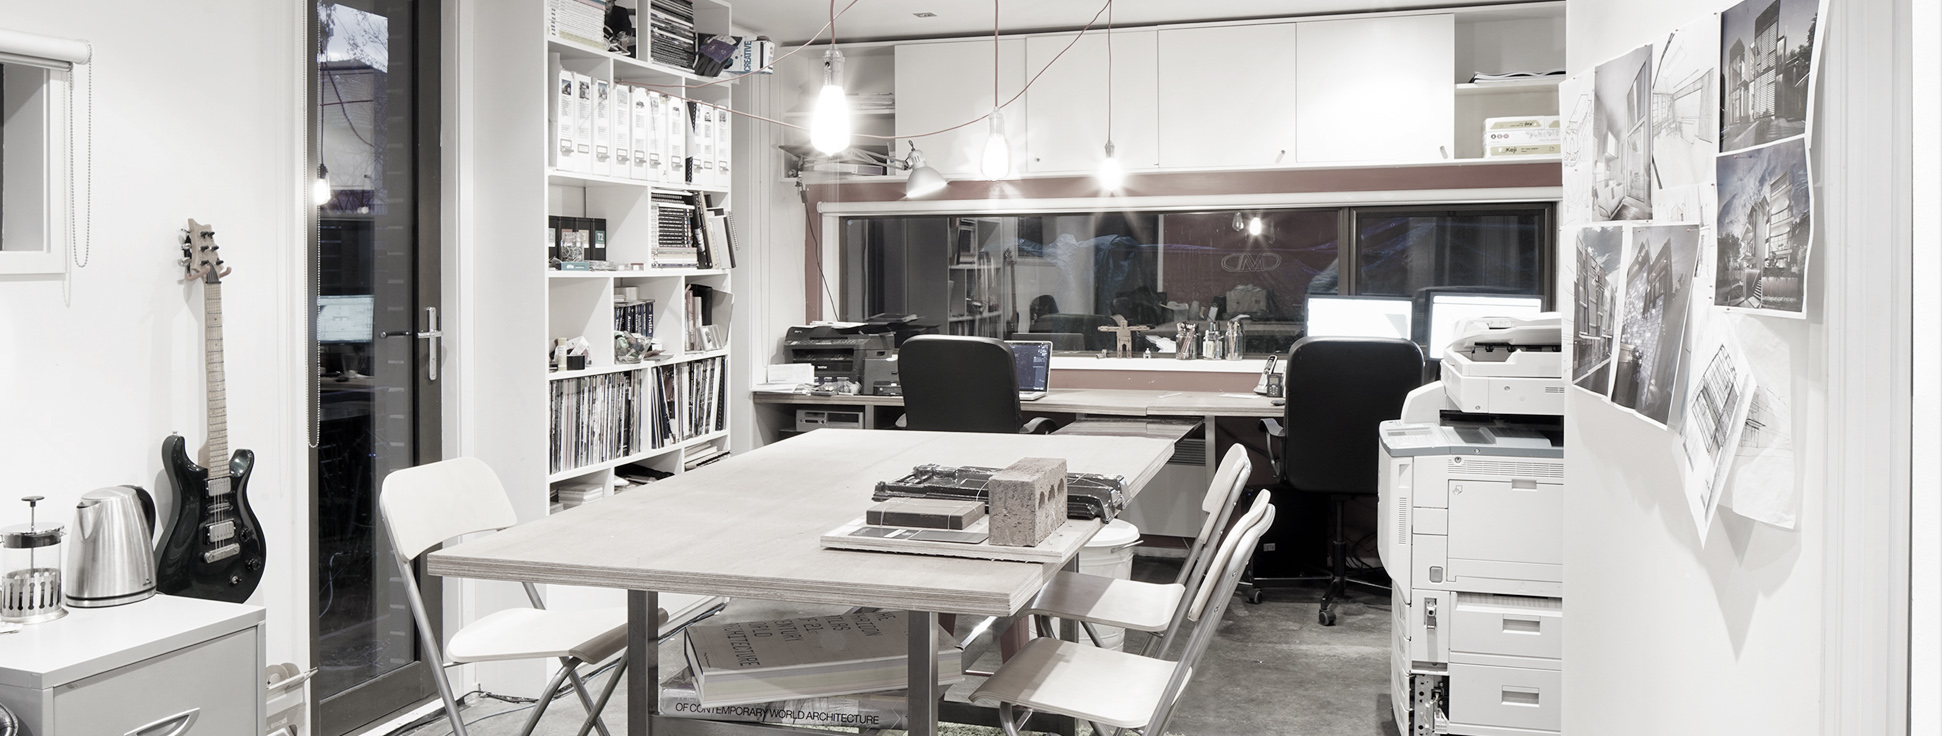 Megowan Architectural Studio